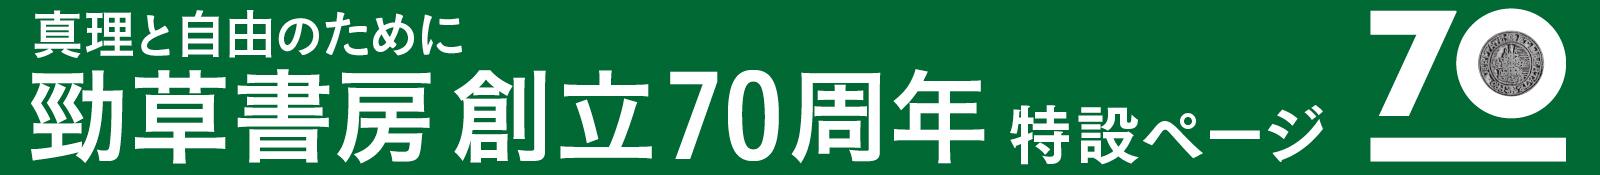 banner_keiso70